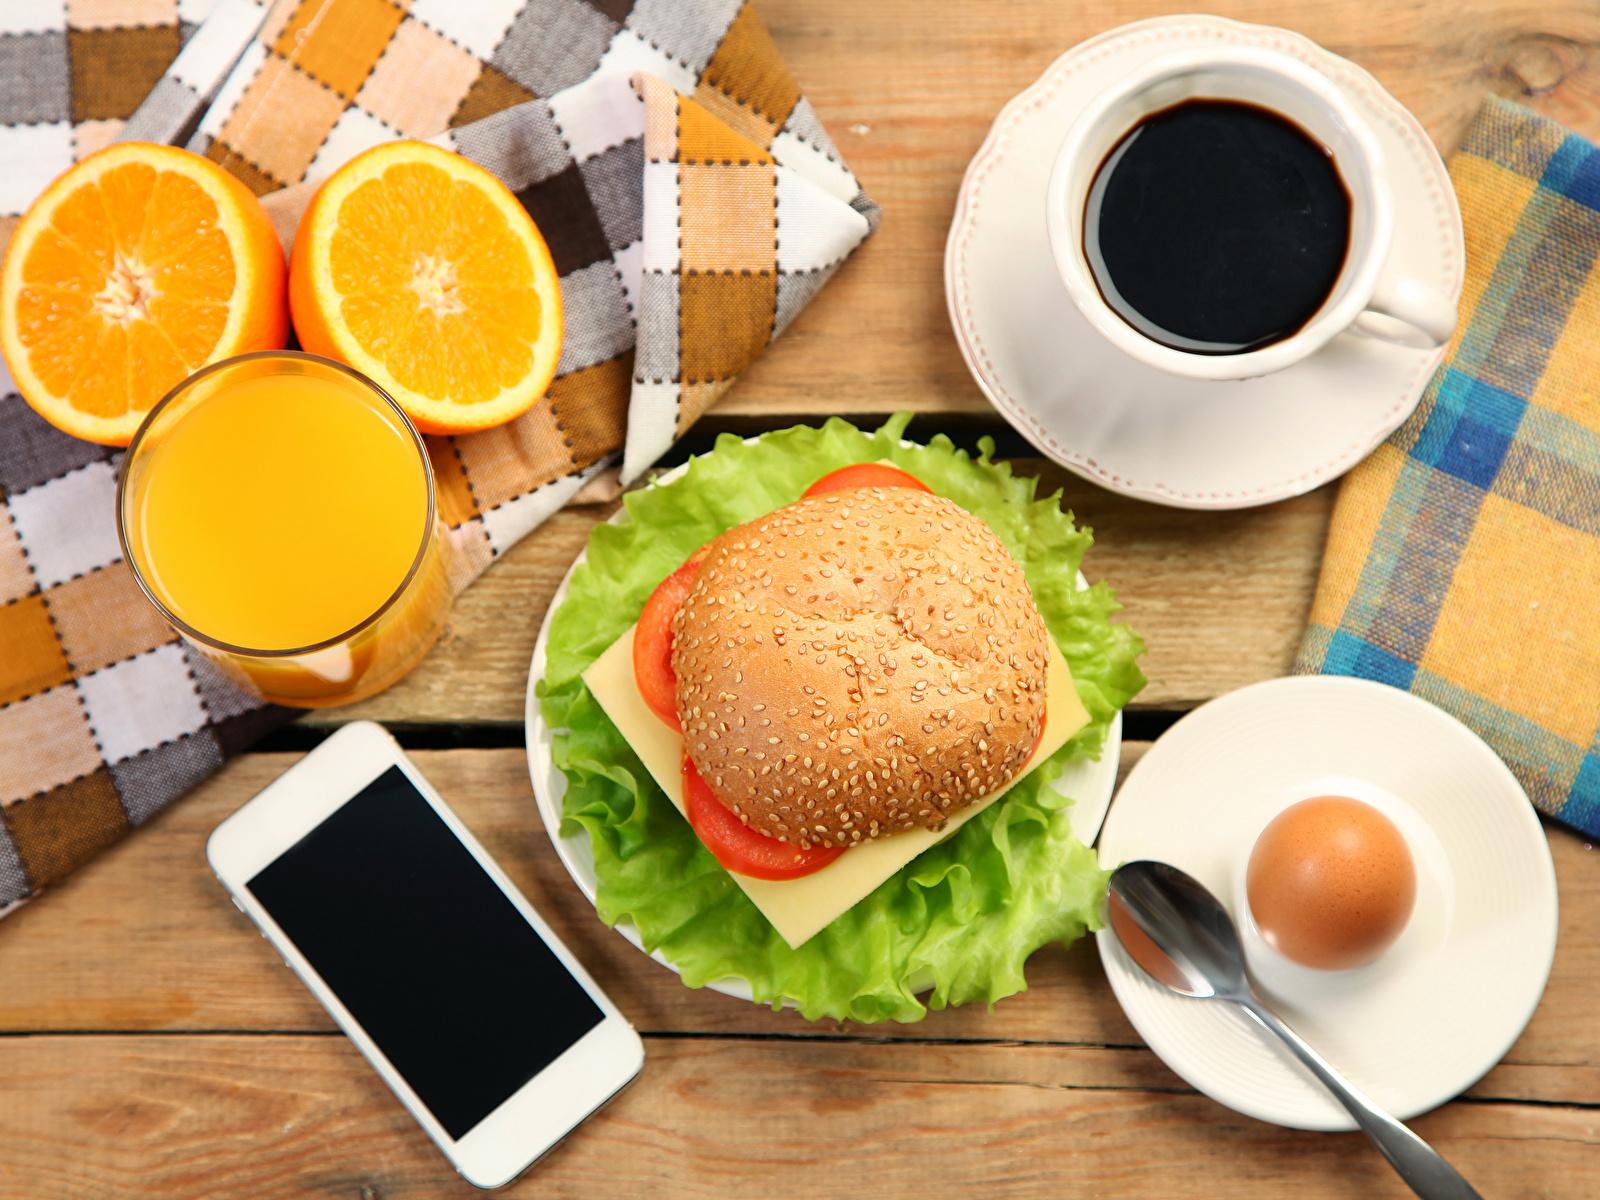 Фотография яйцами Сок Кофе Апельсин телефона Стакан бутерброд Еда Чашка Натюрморт 1600x1200 яиц яйцо Яйца Телефон телефоном стакана стакане Бутерброды Пища чашке Продукты питания